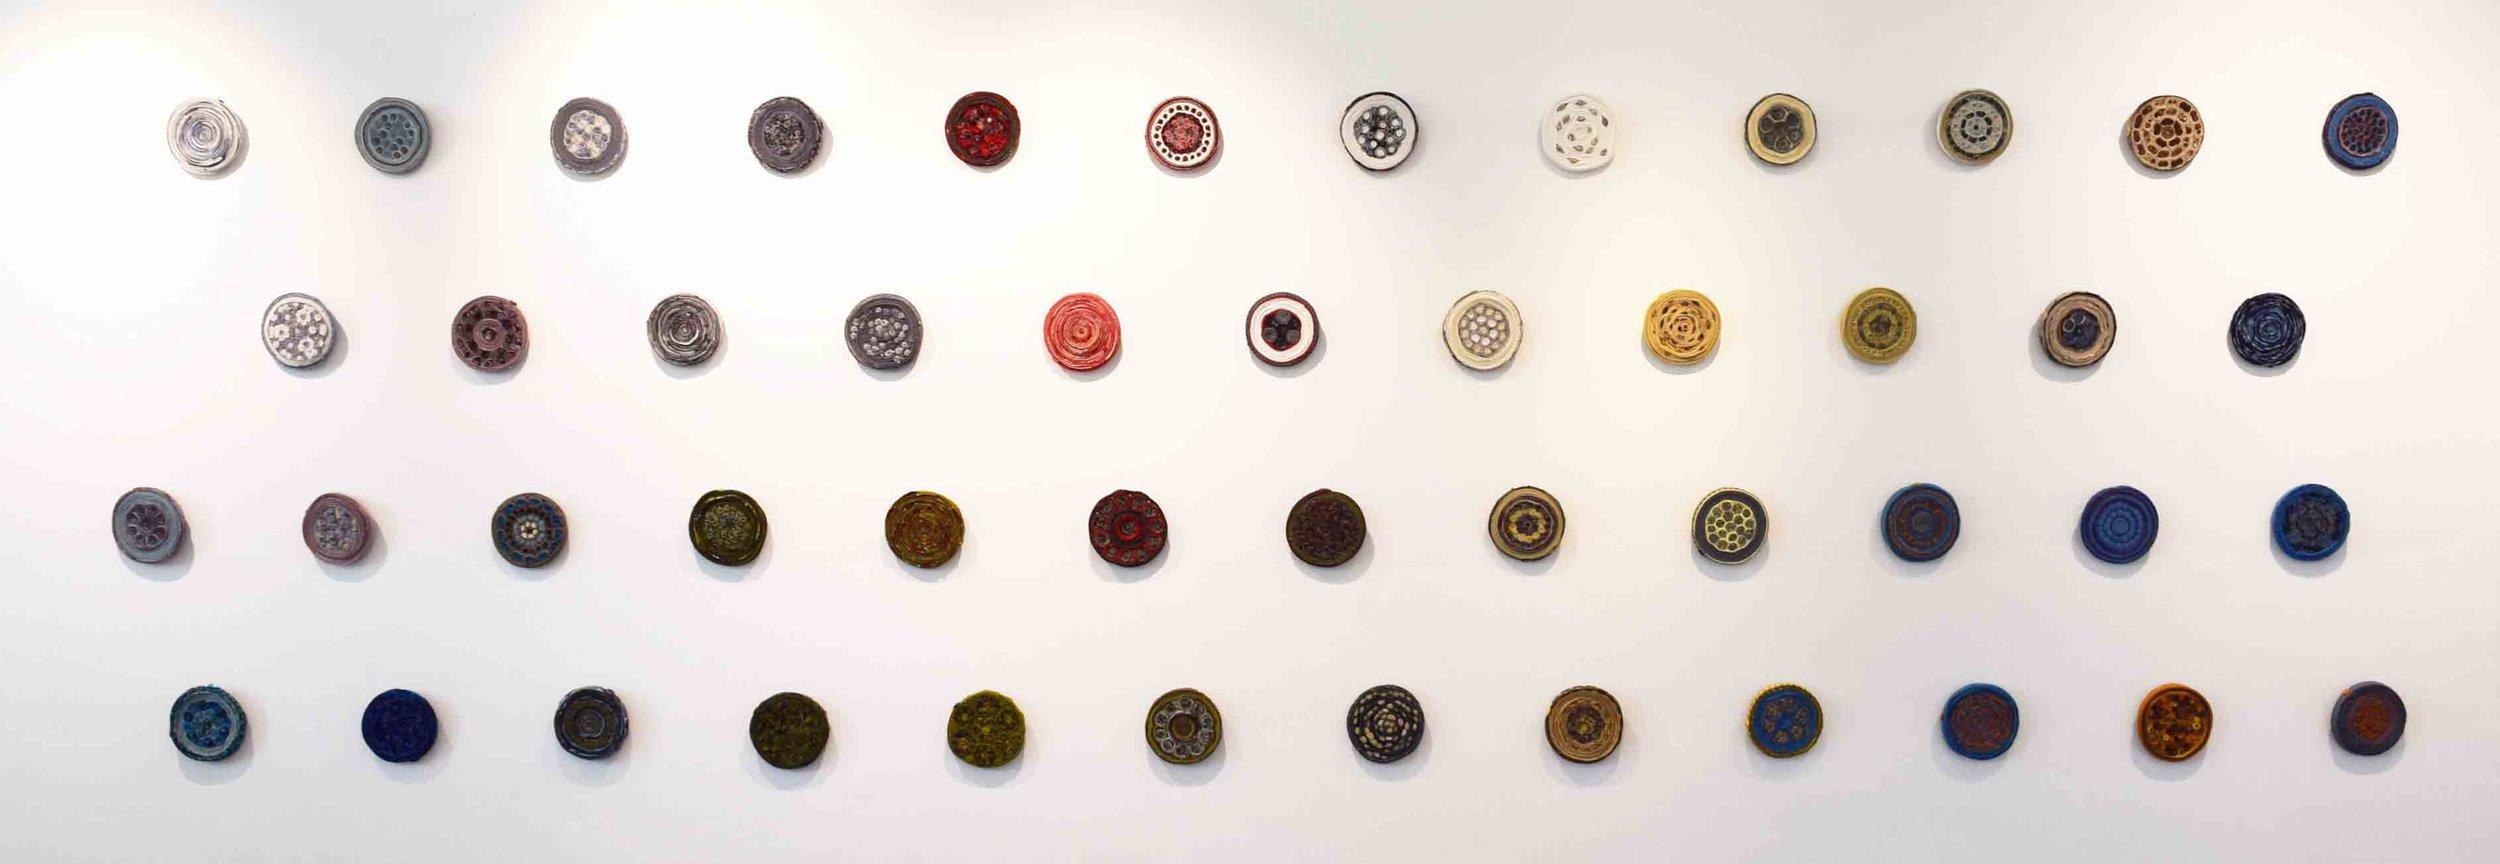 2.  Remington Keys,  2018, various vintage fabrics, business ties 12 x 12 cm$165 each